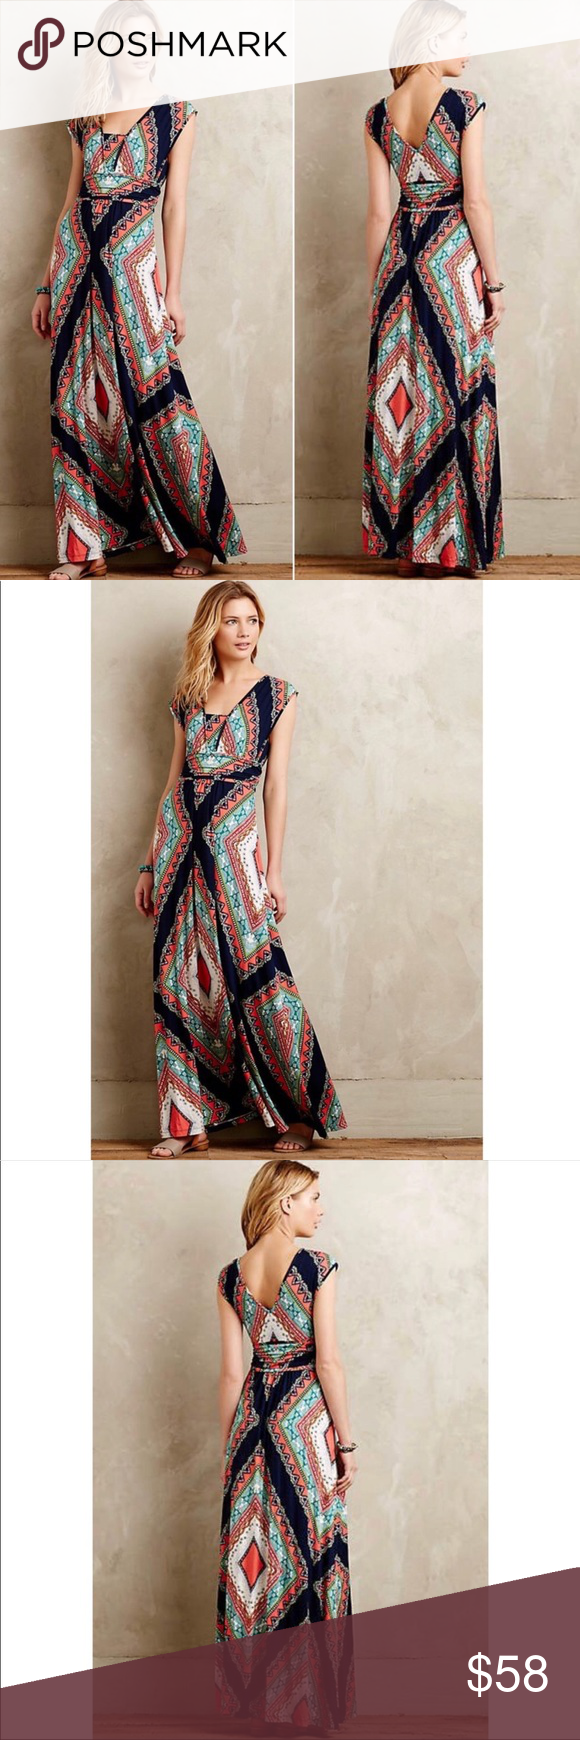 "ANTHROPOLOGIE Maeve Verda Maxi Dress ANTHROPOLOGIE Maeve Verda Maxi Dress  Size m e d i u m. Armpit to armpit 16"" 45edff06934"